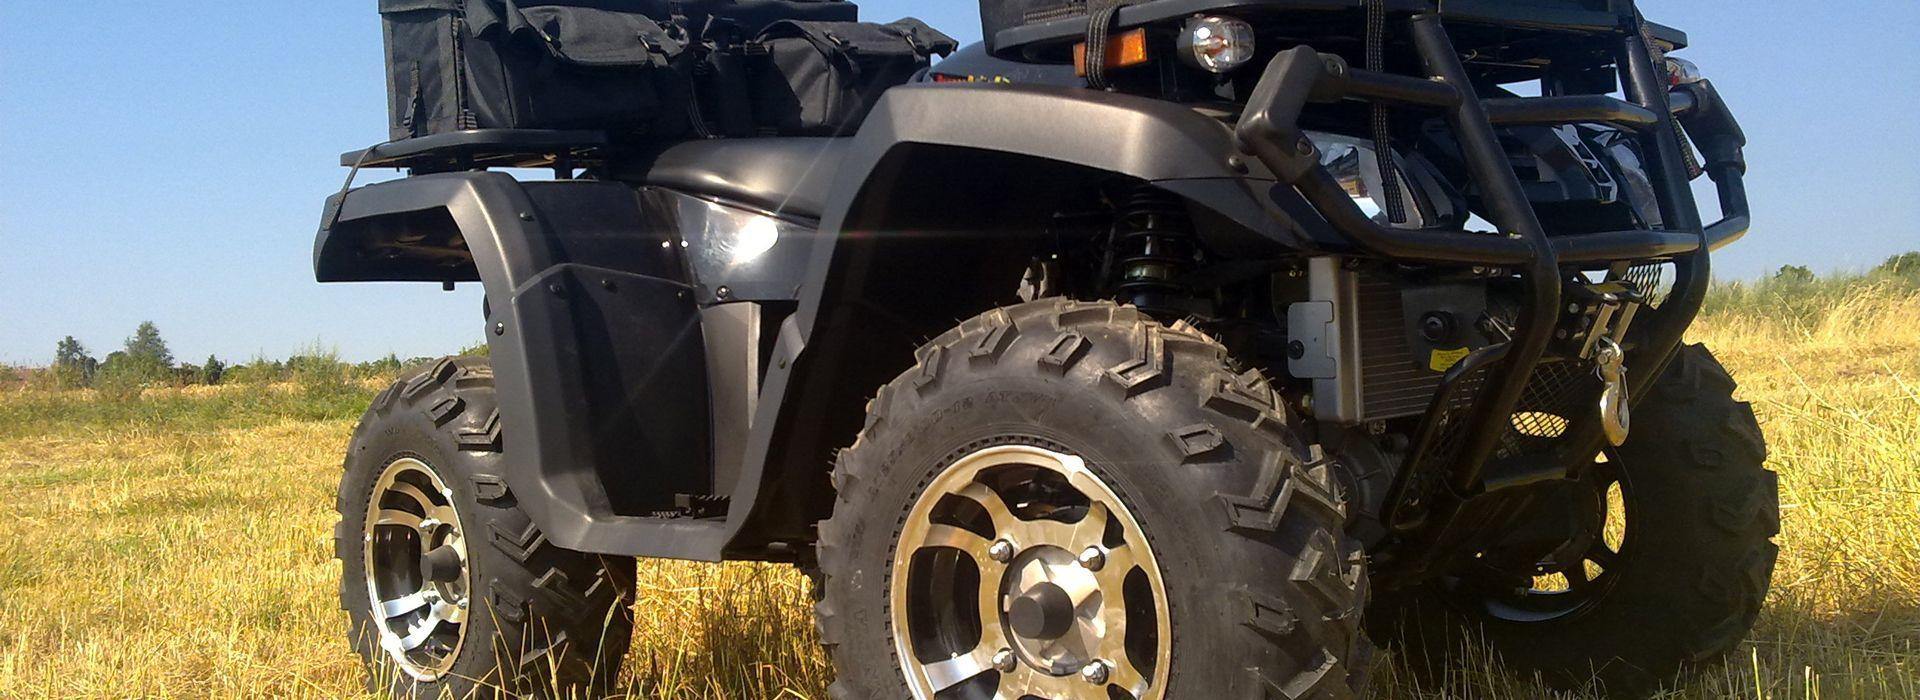 Predator 300ccm 4x4